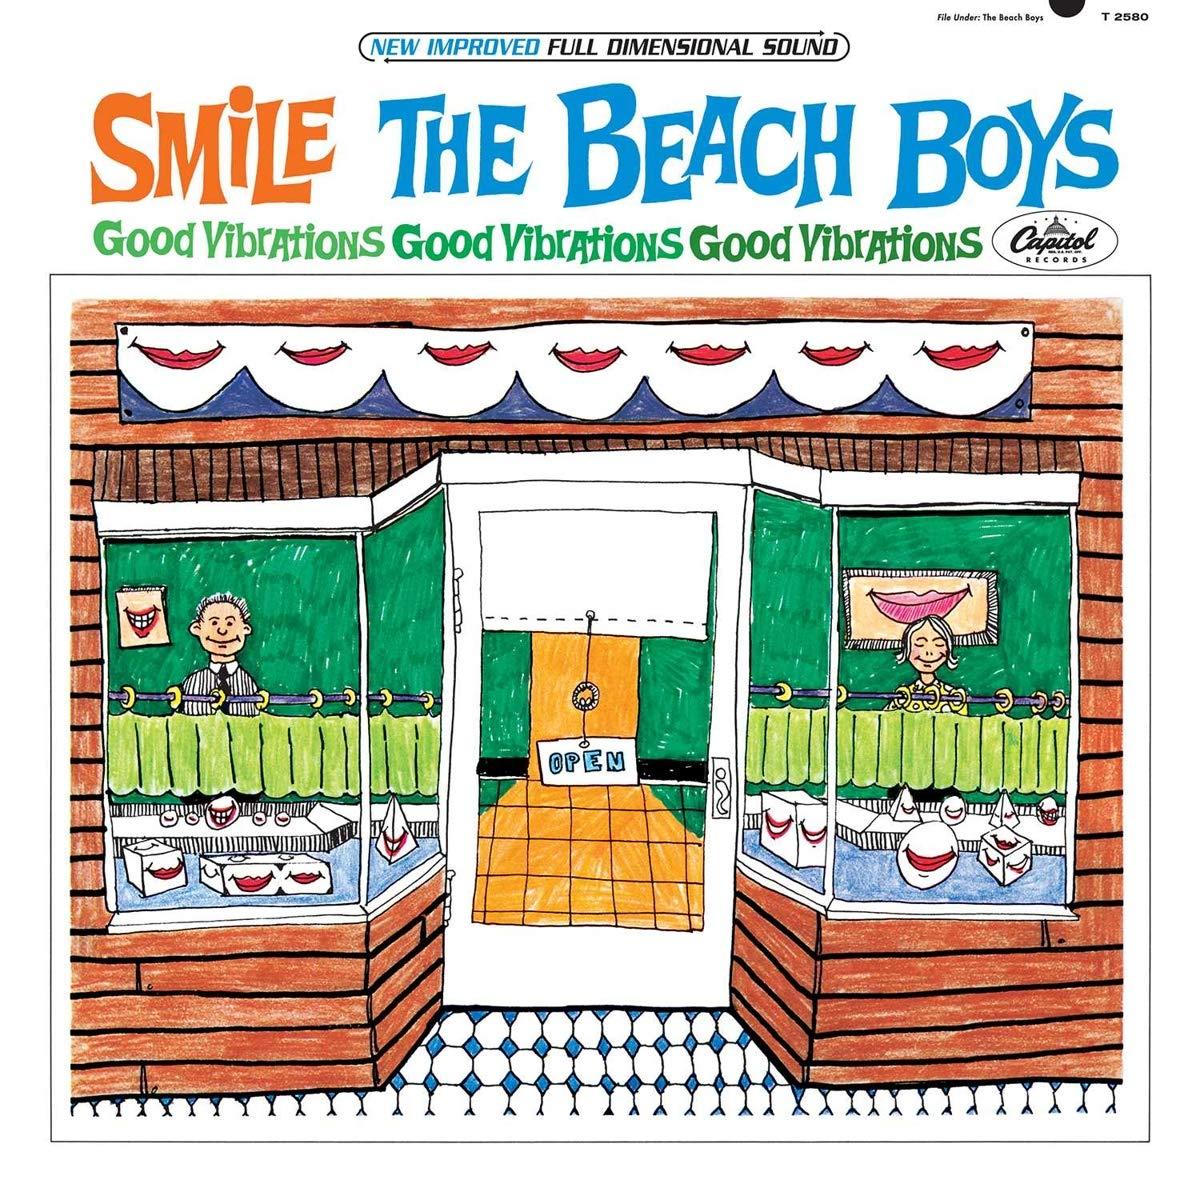 The Smile Sessions: The Beach Boys, The Beach Boys: Amazon.fr: Musique